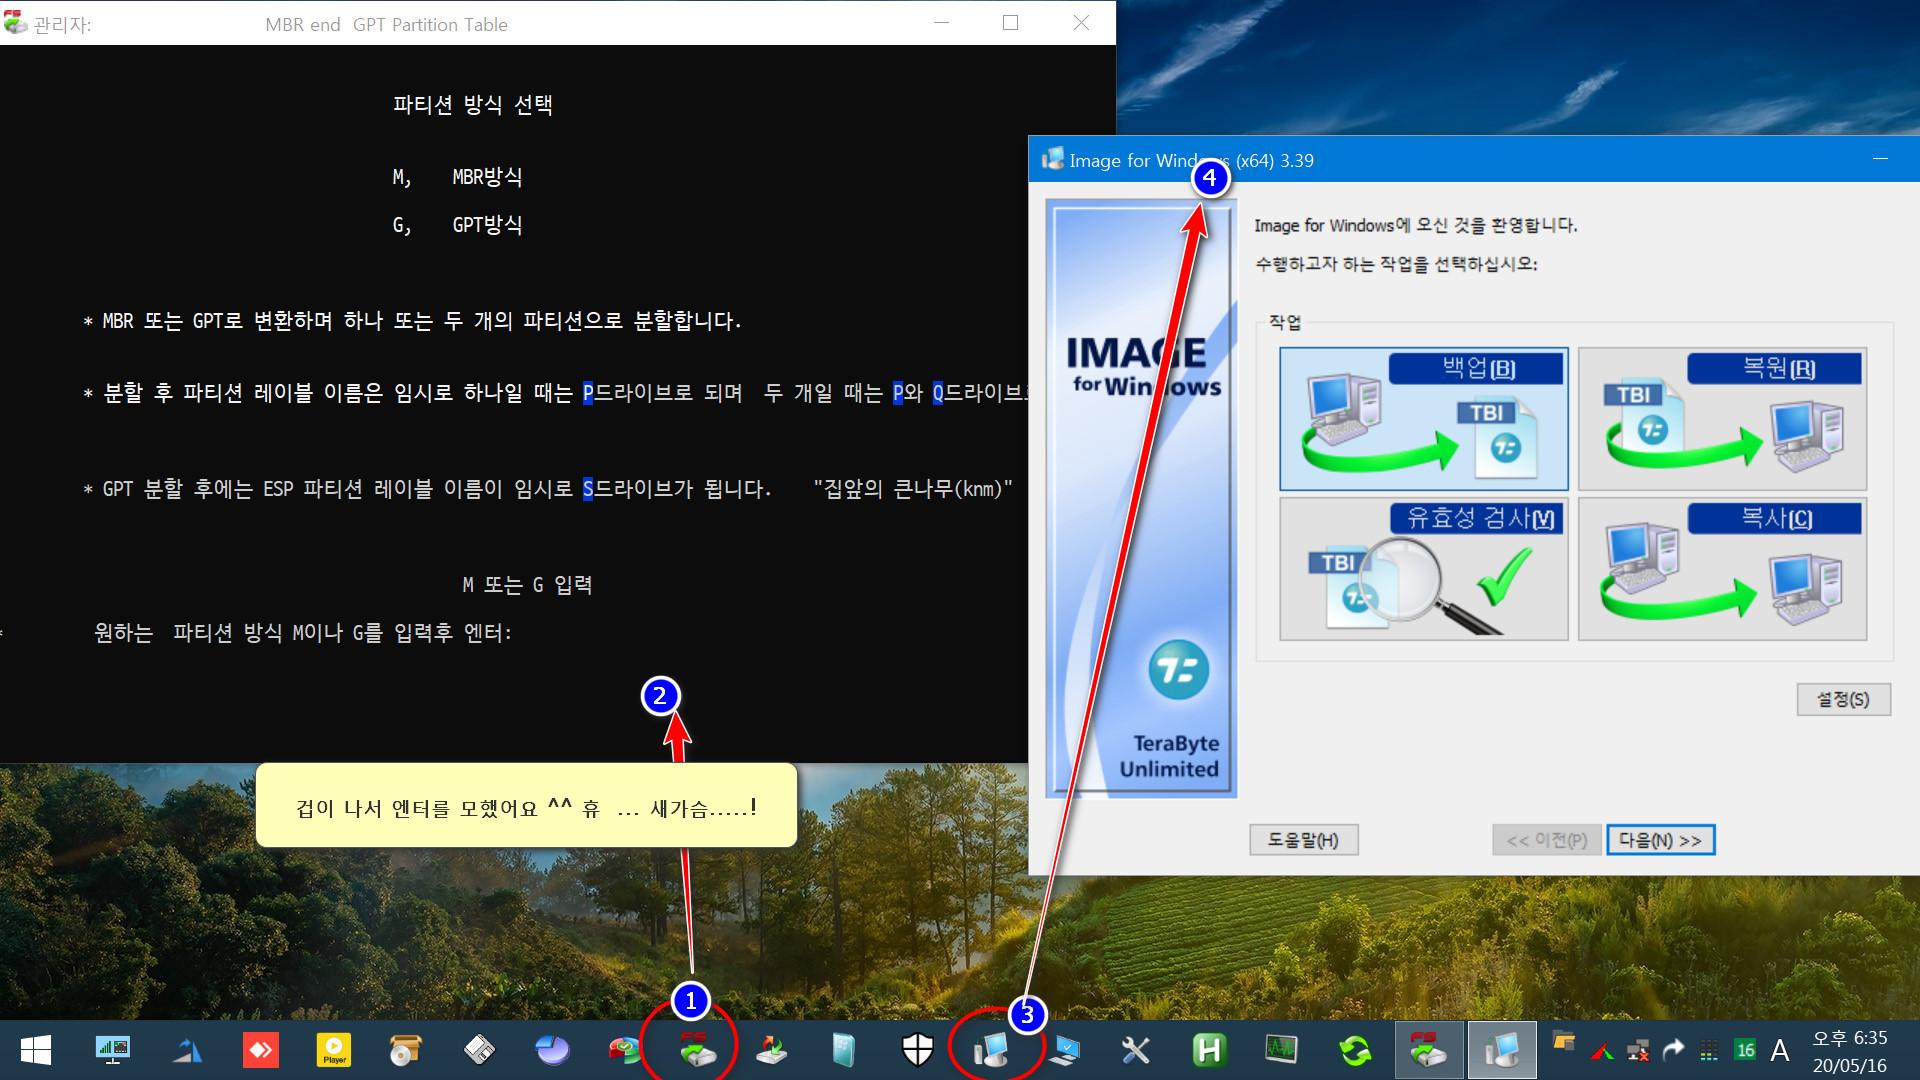 KNM-DREAMing Usain St. Leo Bolt  -  _x64- 01.jpg